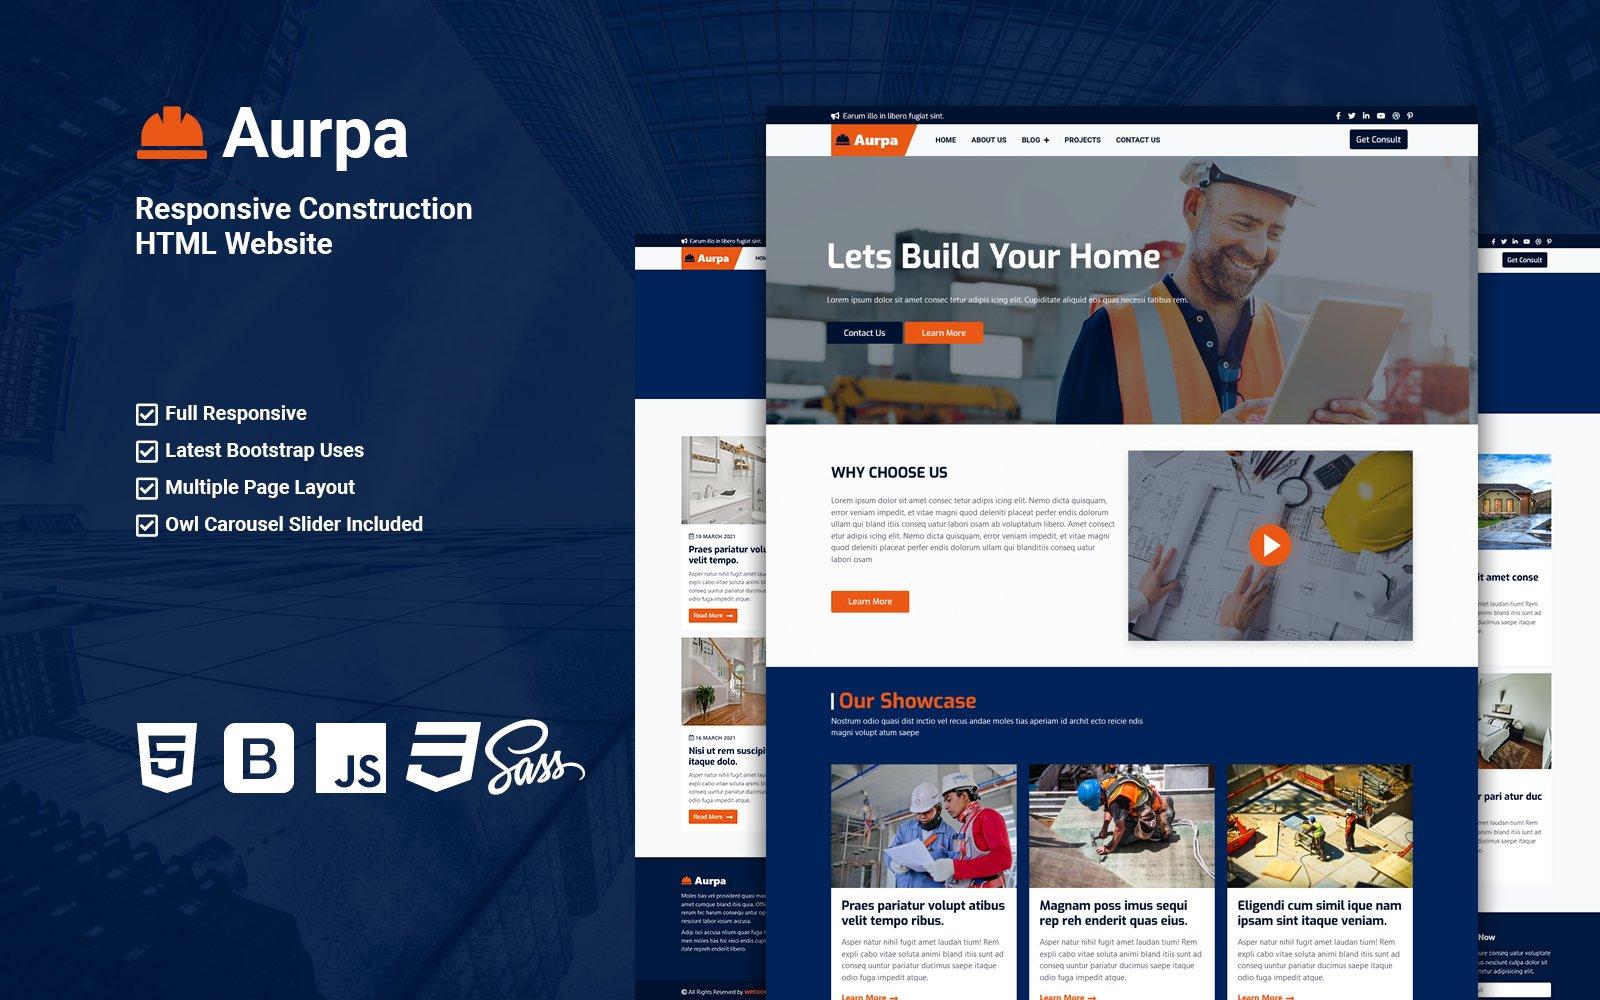 Aurpa - Responsive Construction HTML Website